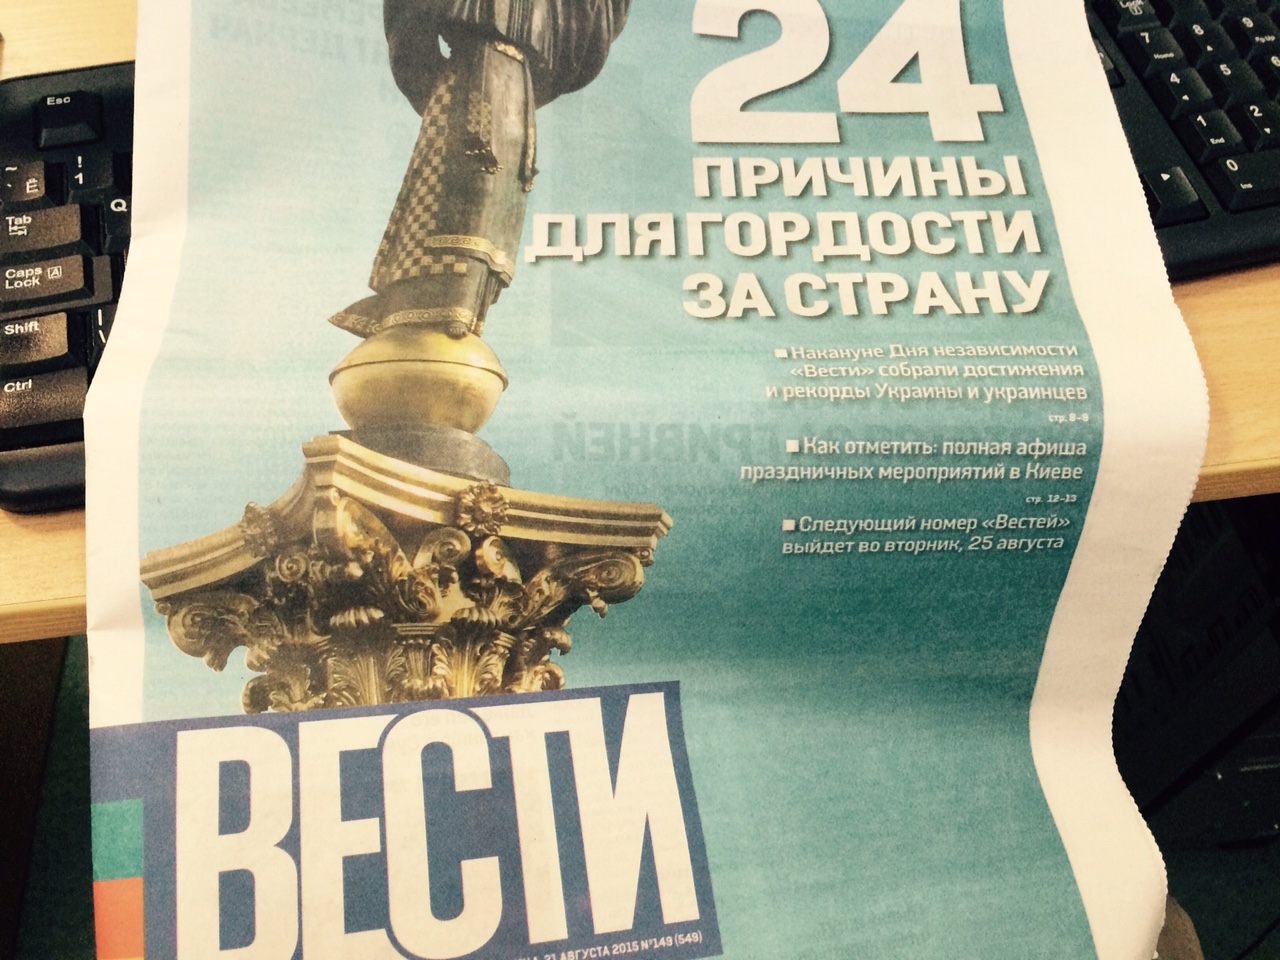 Vesti's first page